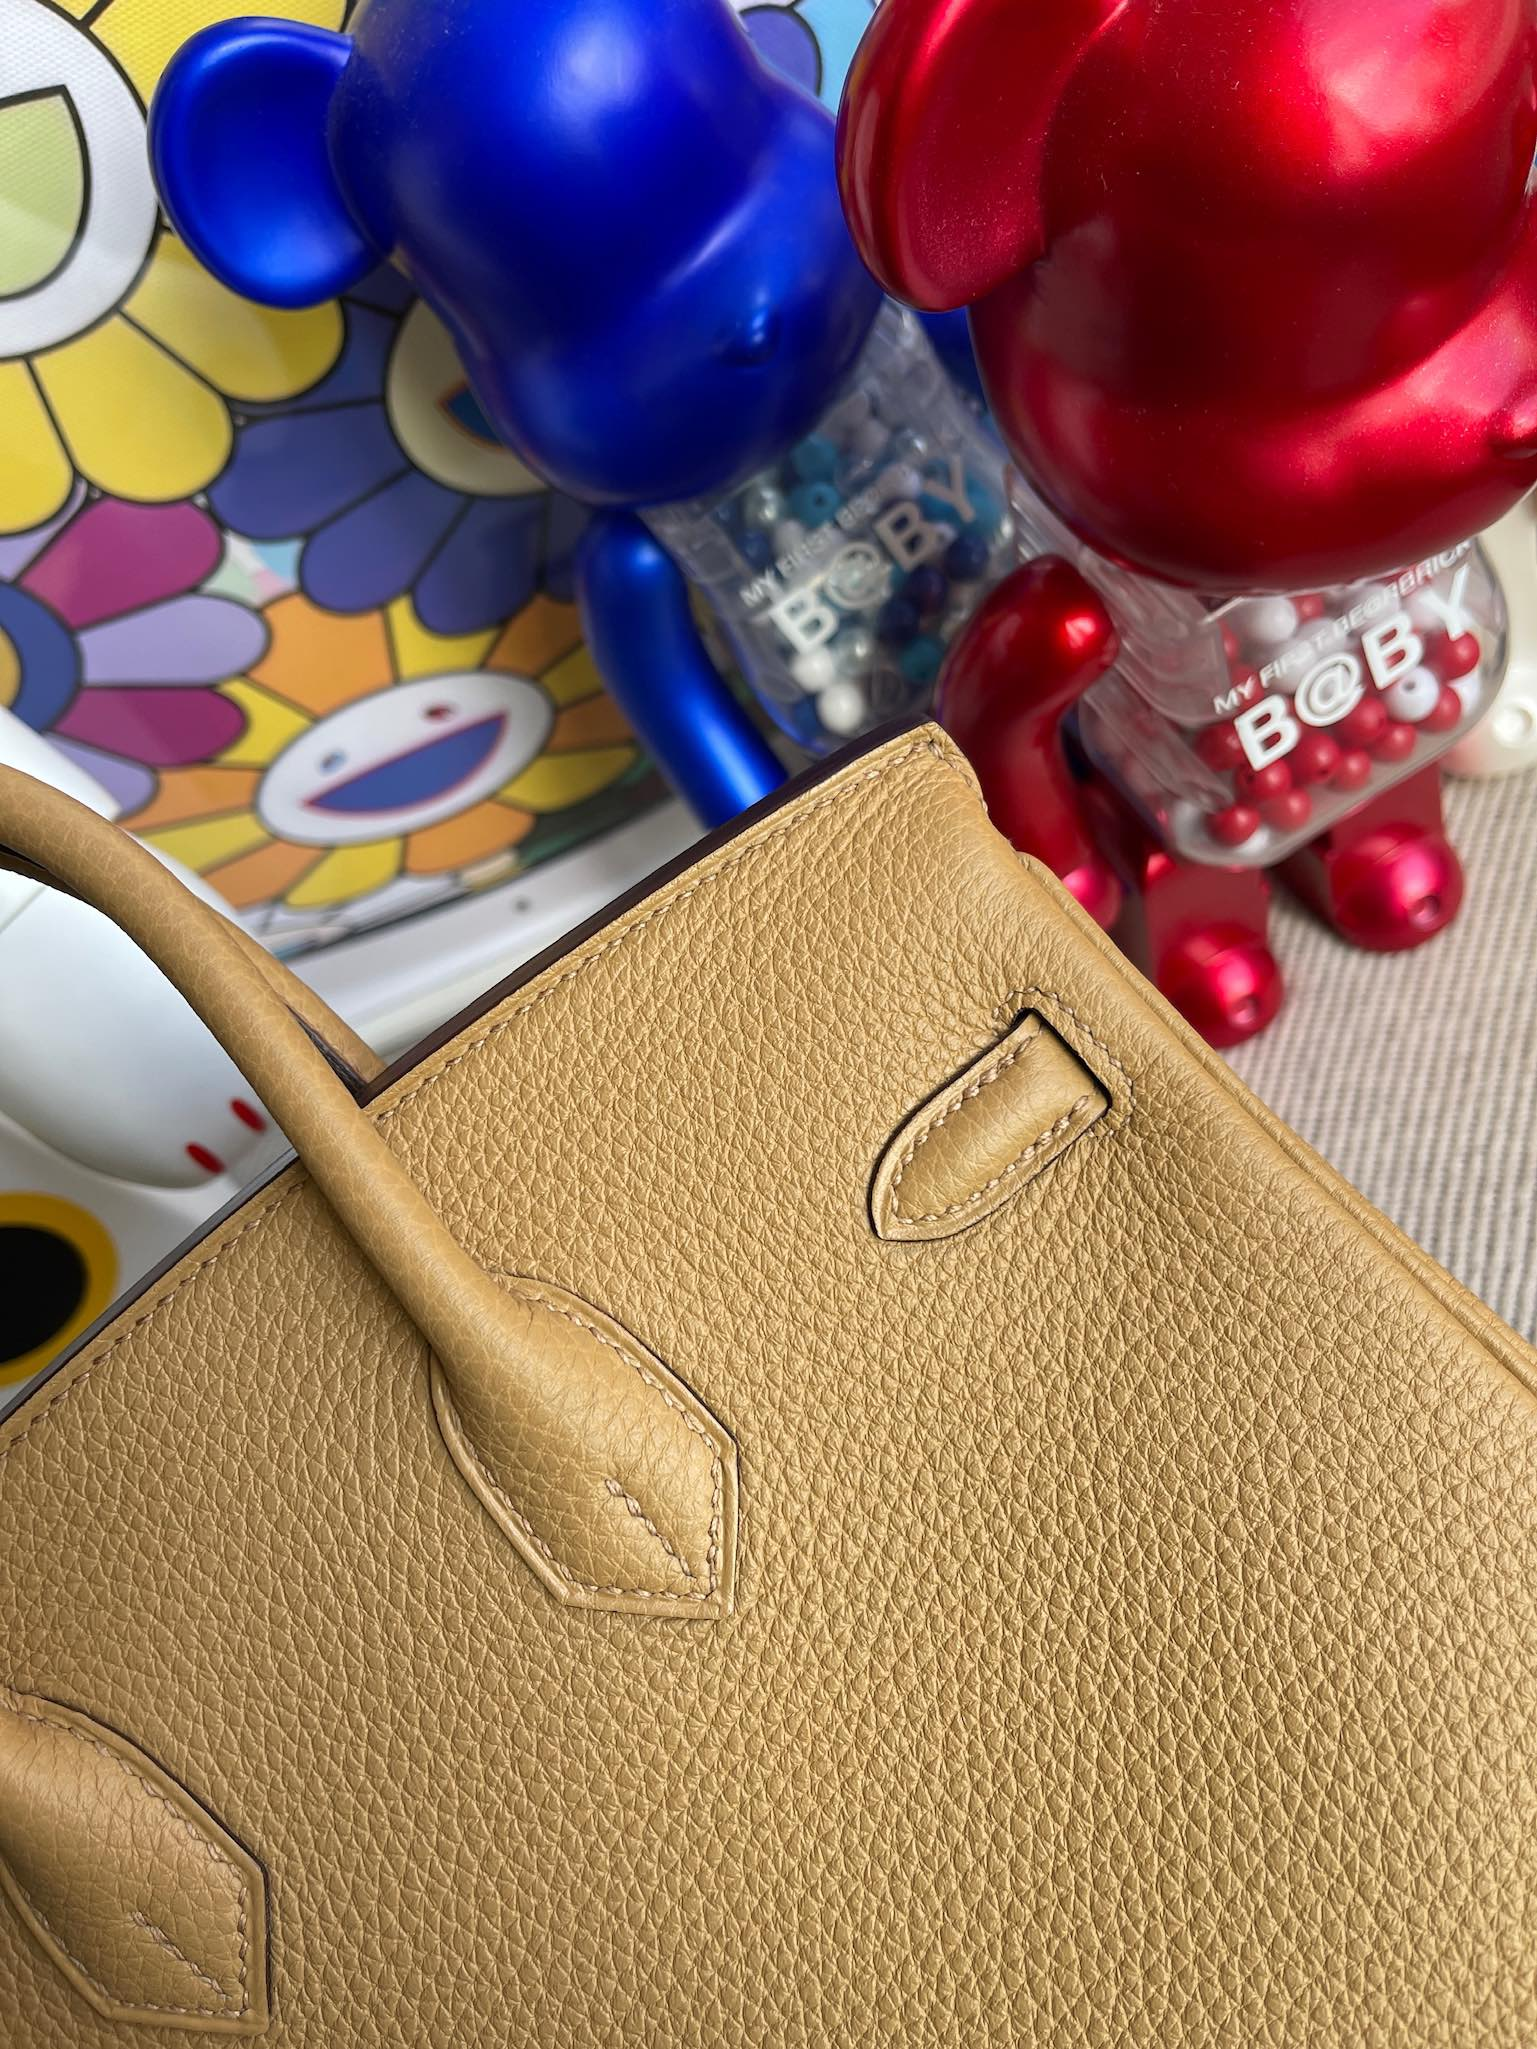 Hermès(爱马仕)Birkin 铂金包 原厂小牛皮 4B 饼干色 金扣 25cm 顶级手缝